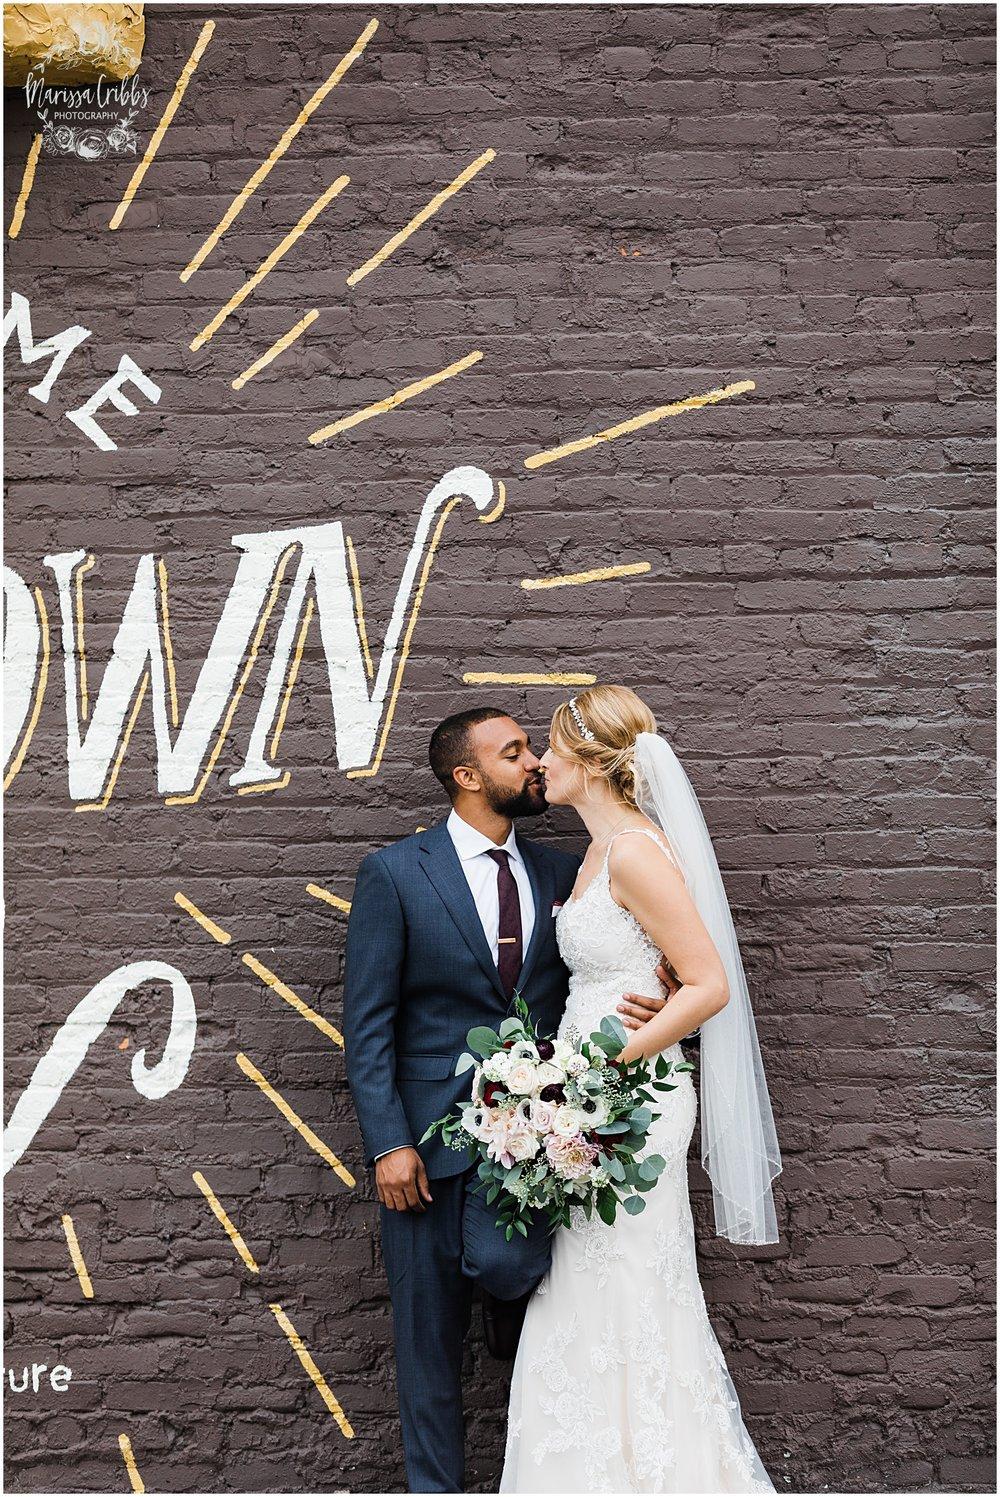 BAUER WEDDING   KELSEA & JUSTIN   MARISSA CRIBBS PHOTOGRAPHY_6539.jpg